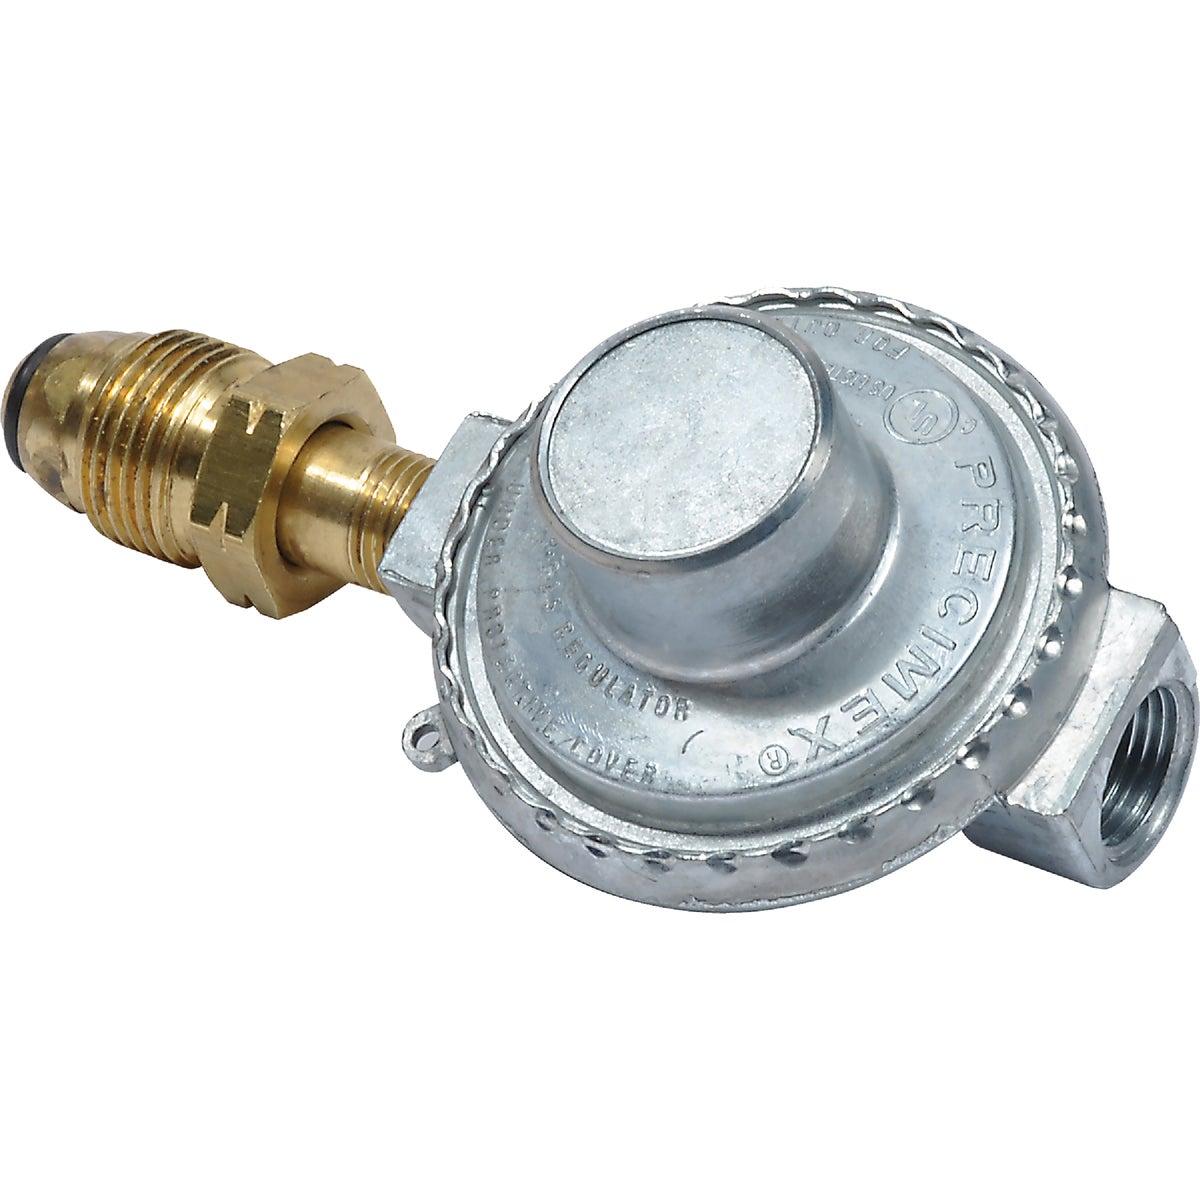 Mr. Heater LOW PRESSURE REGULATOR F276136